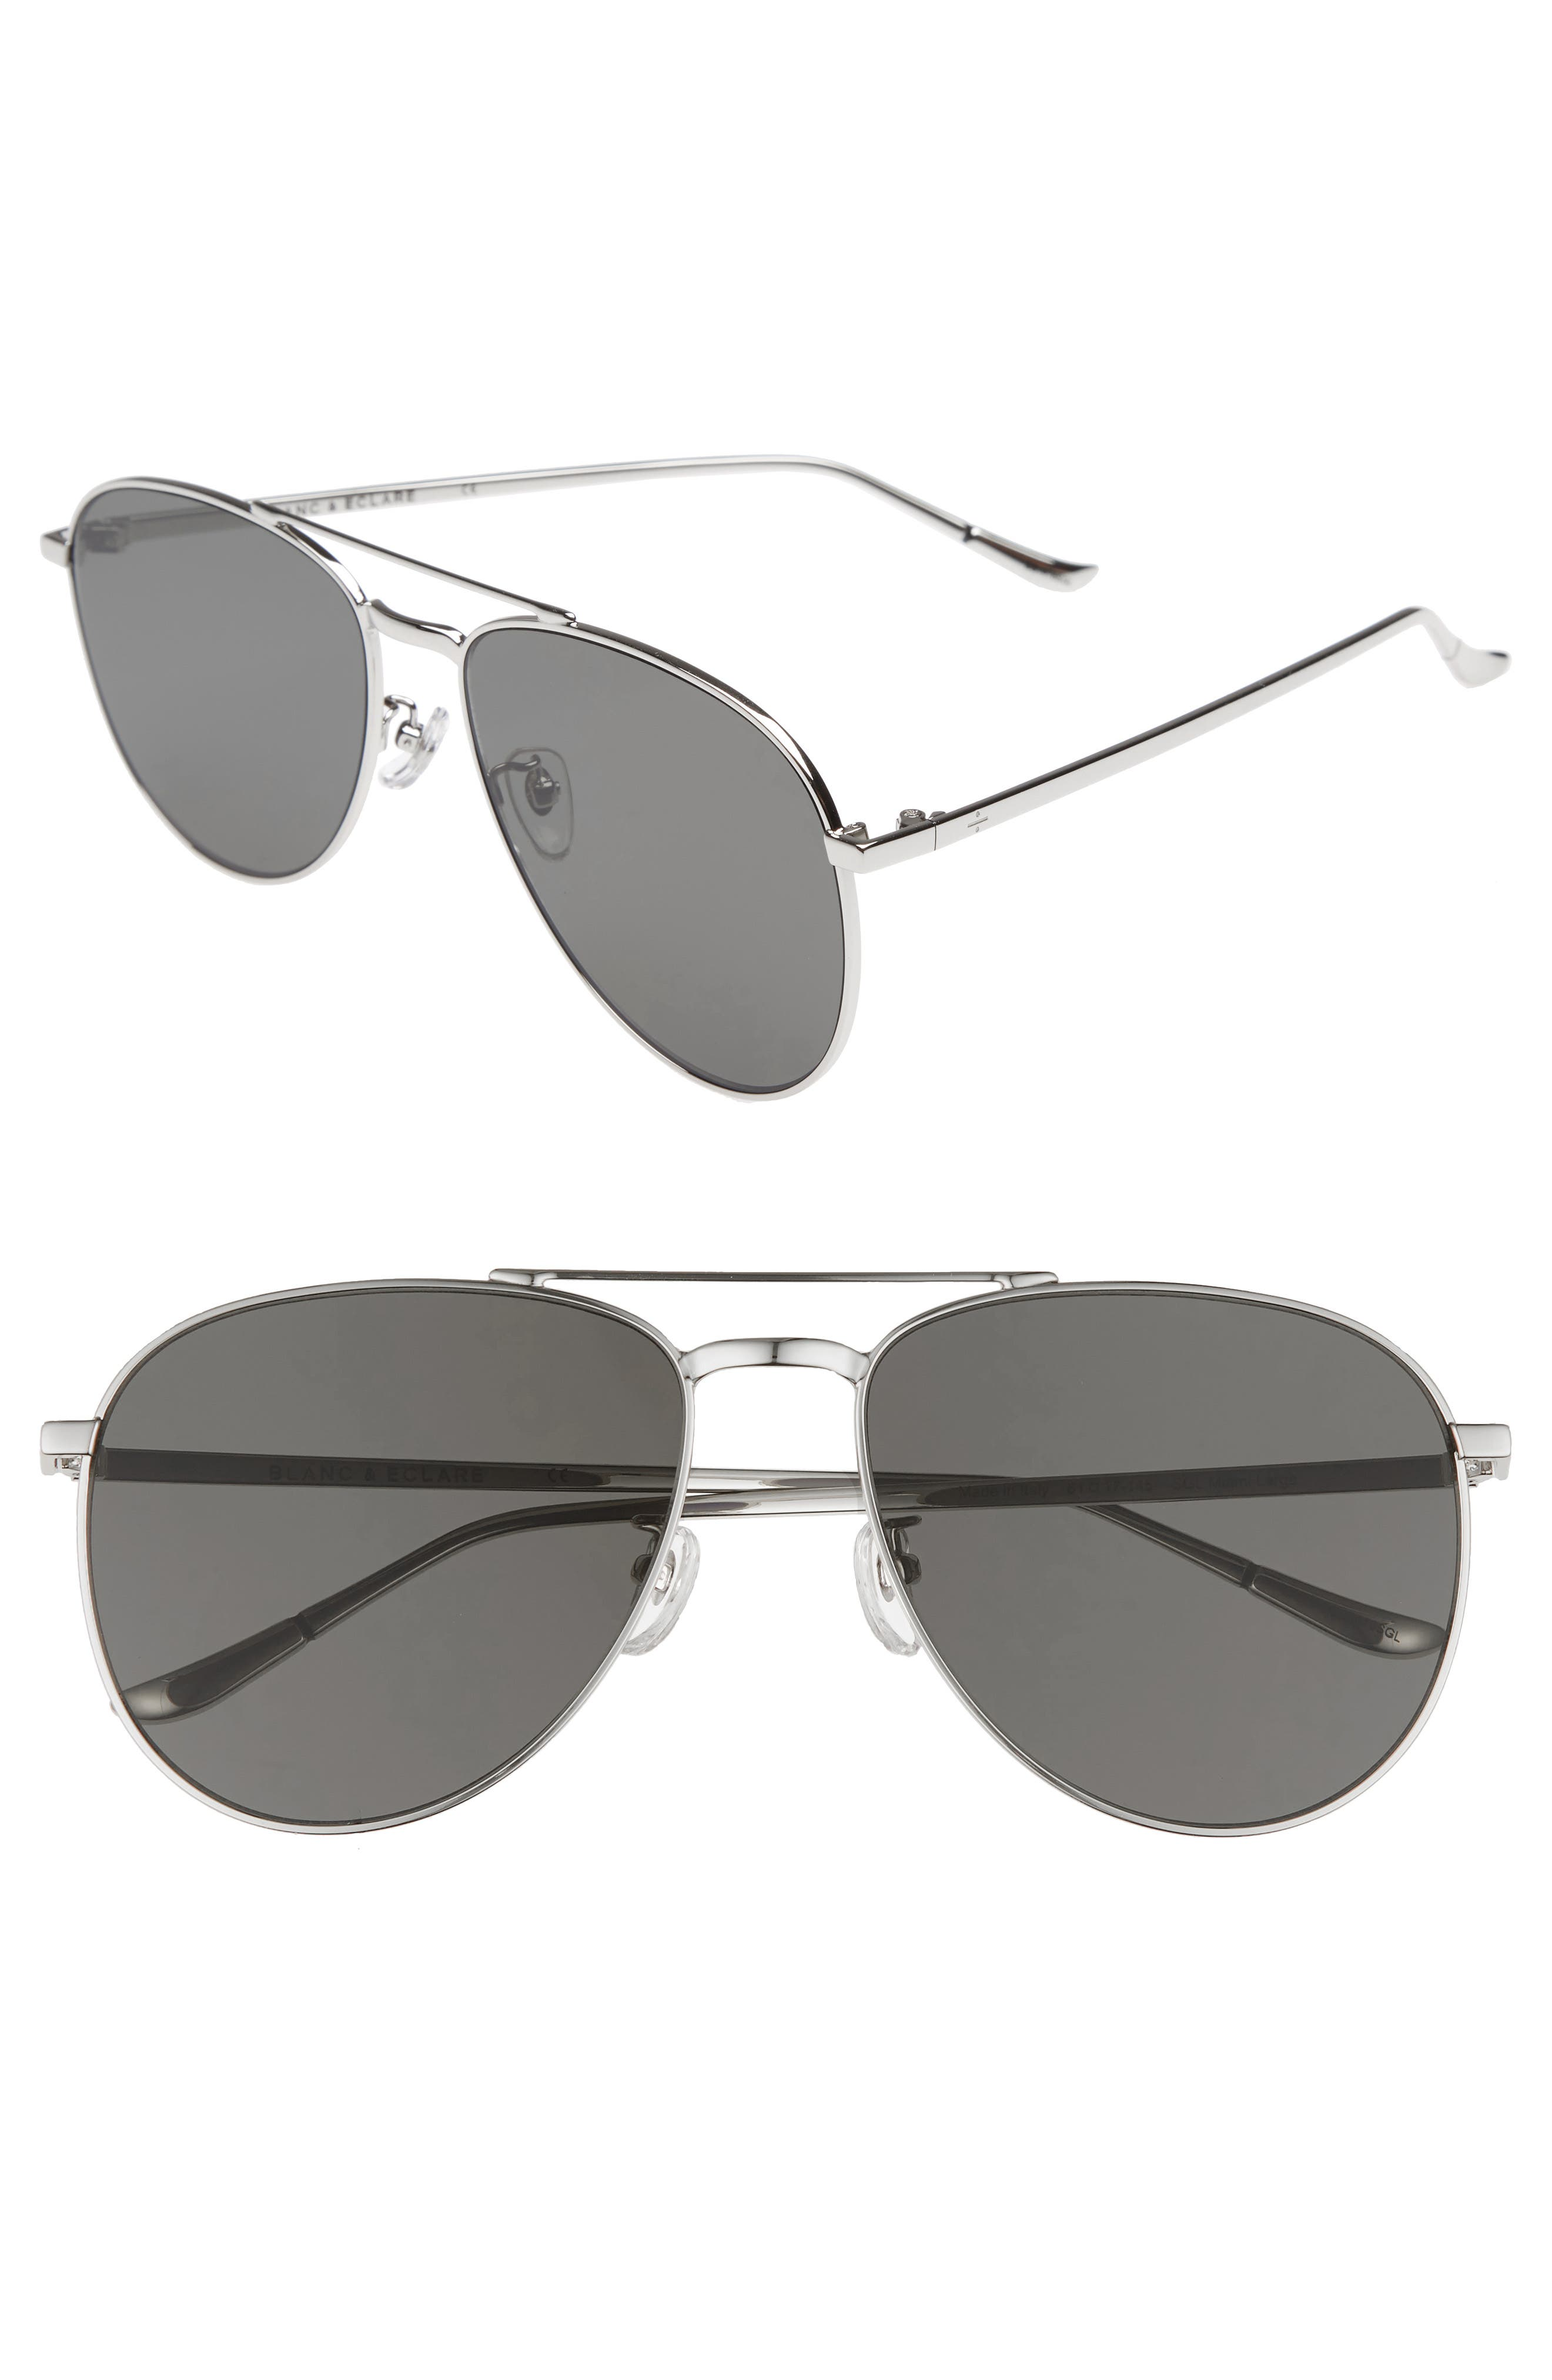 BLANC & ECLARE Miami 61mm Large Polarized Aviator Sunglasses,                             Main thumbnail 1, color,                             040